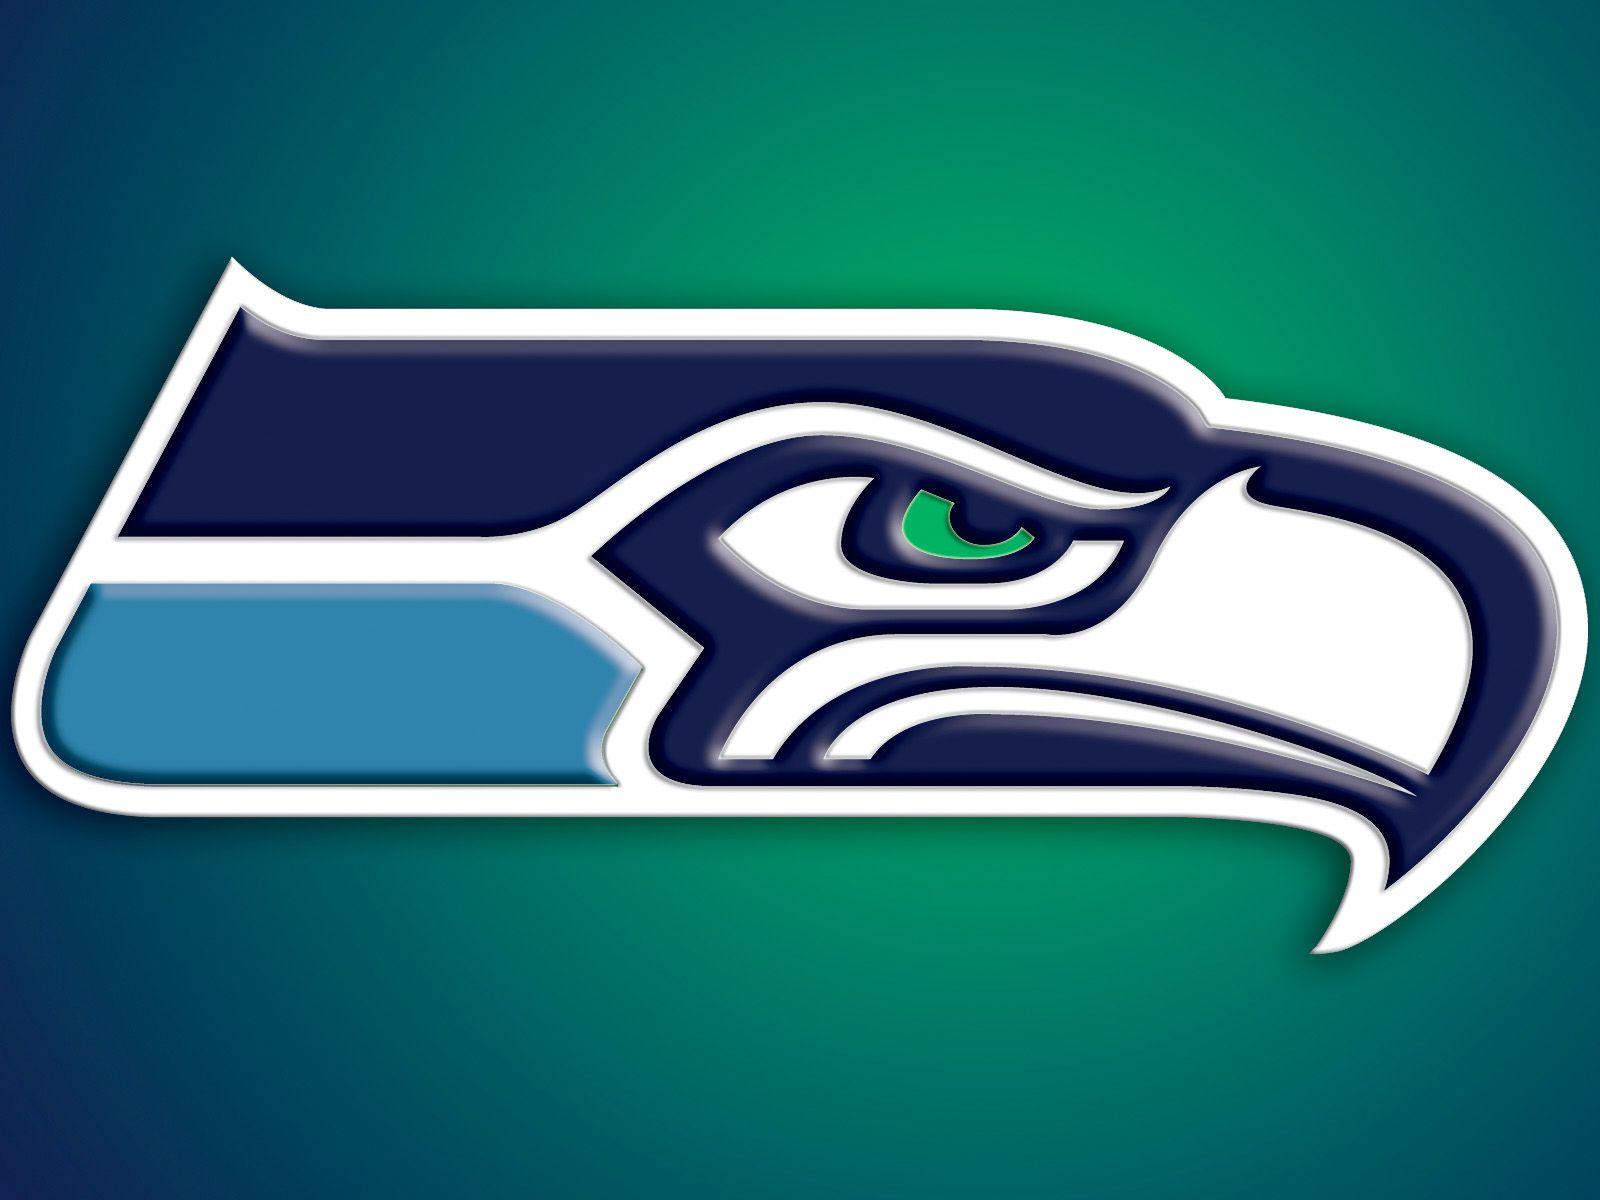 Seattle Seahawks Cheerleaders www.bet at home.com angielski Miranda Jones